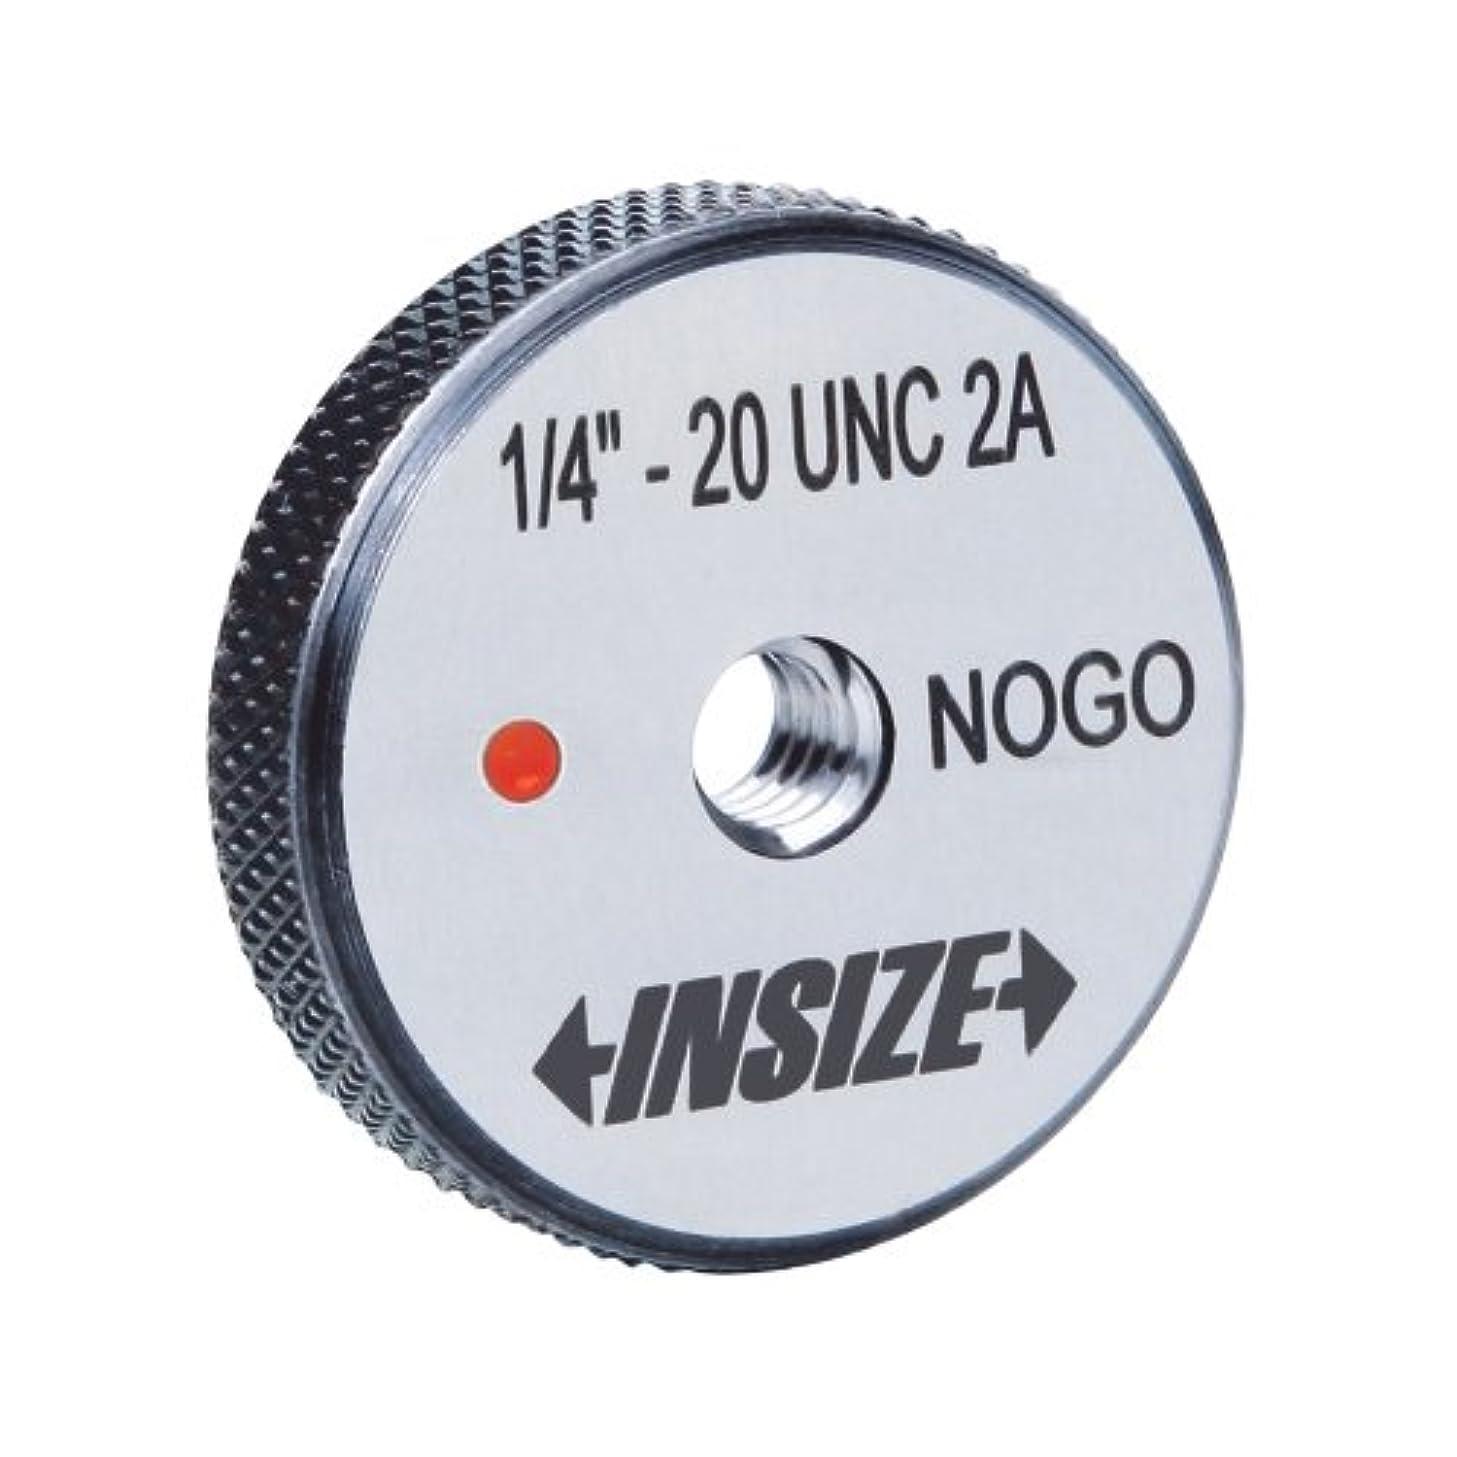 INSIZE 4121-5D1N American Standard Thread Ring Gage, No Go, 5/16-18 UNC